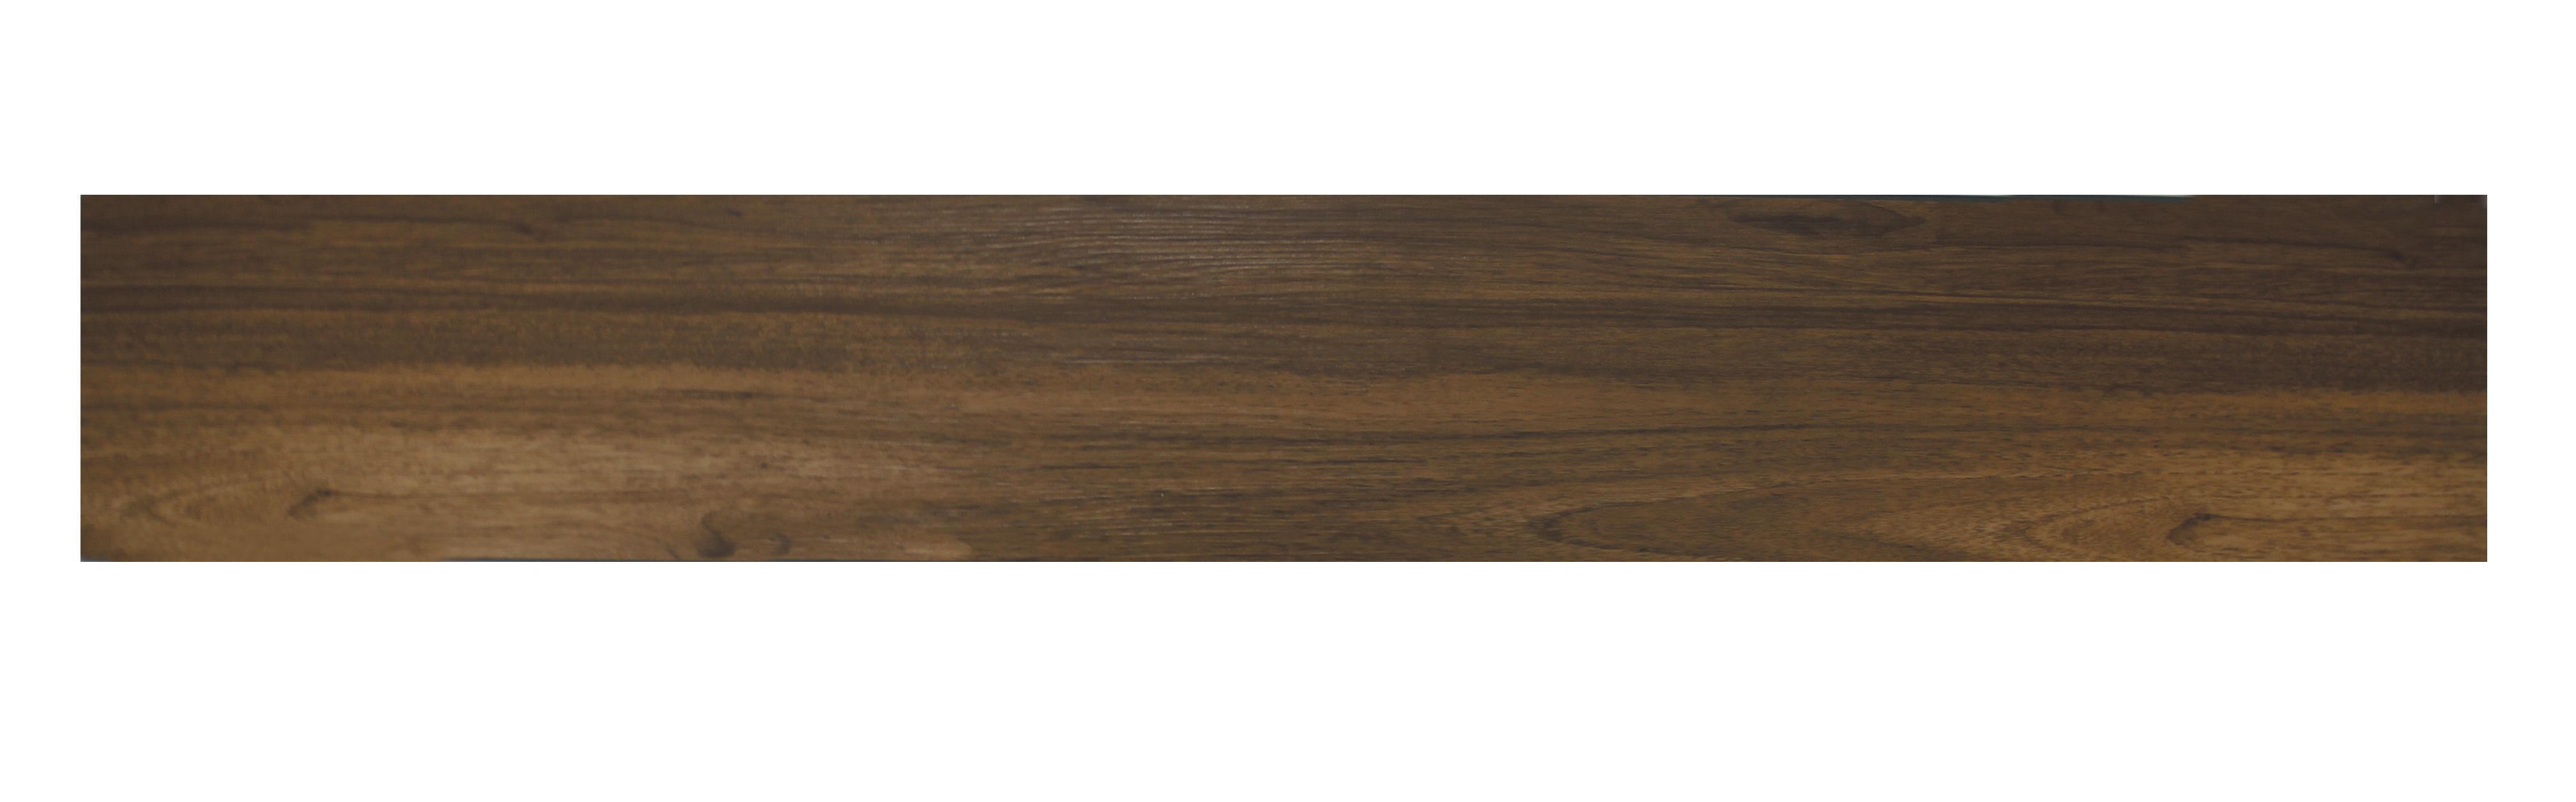 Neufloor resilient flooring for Resilient flooring